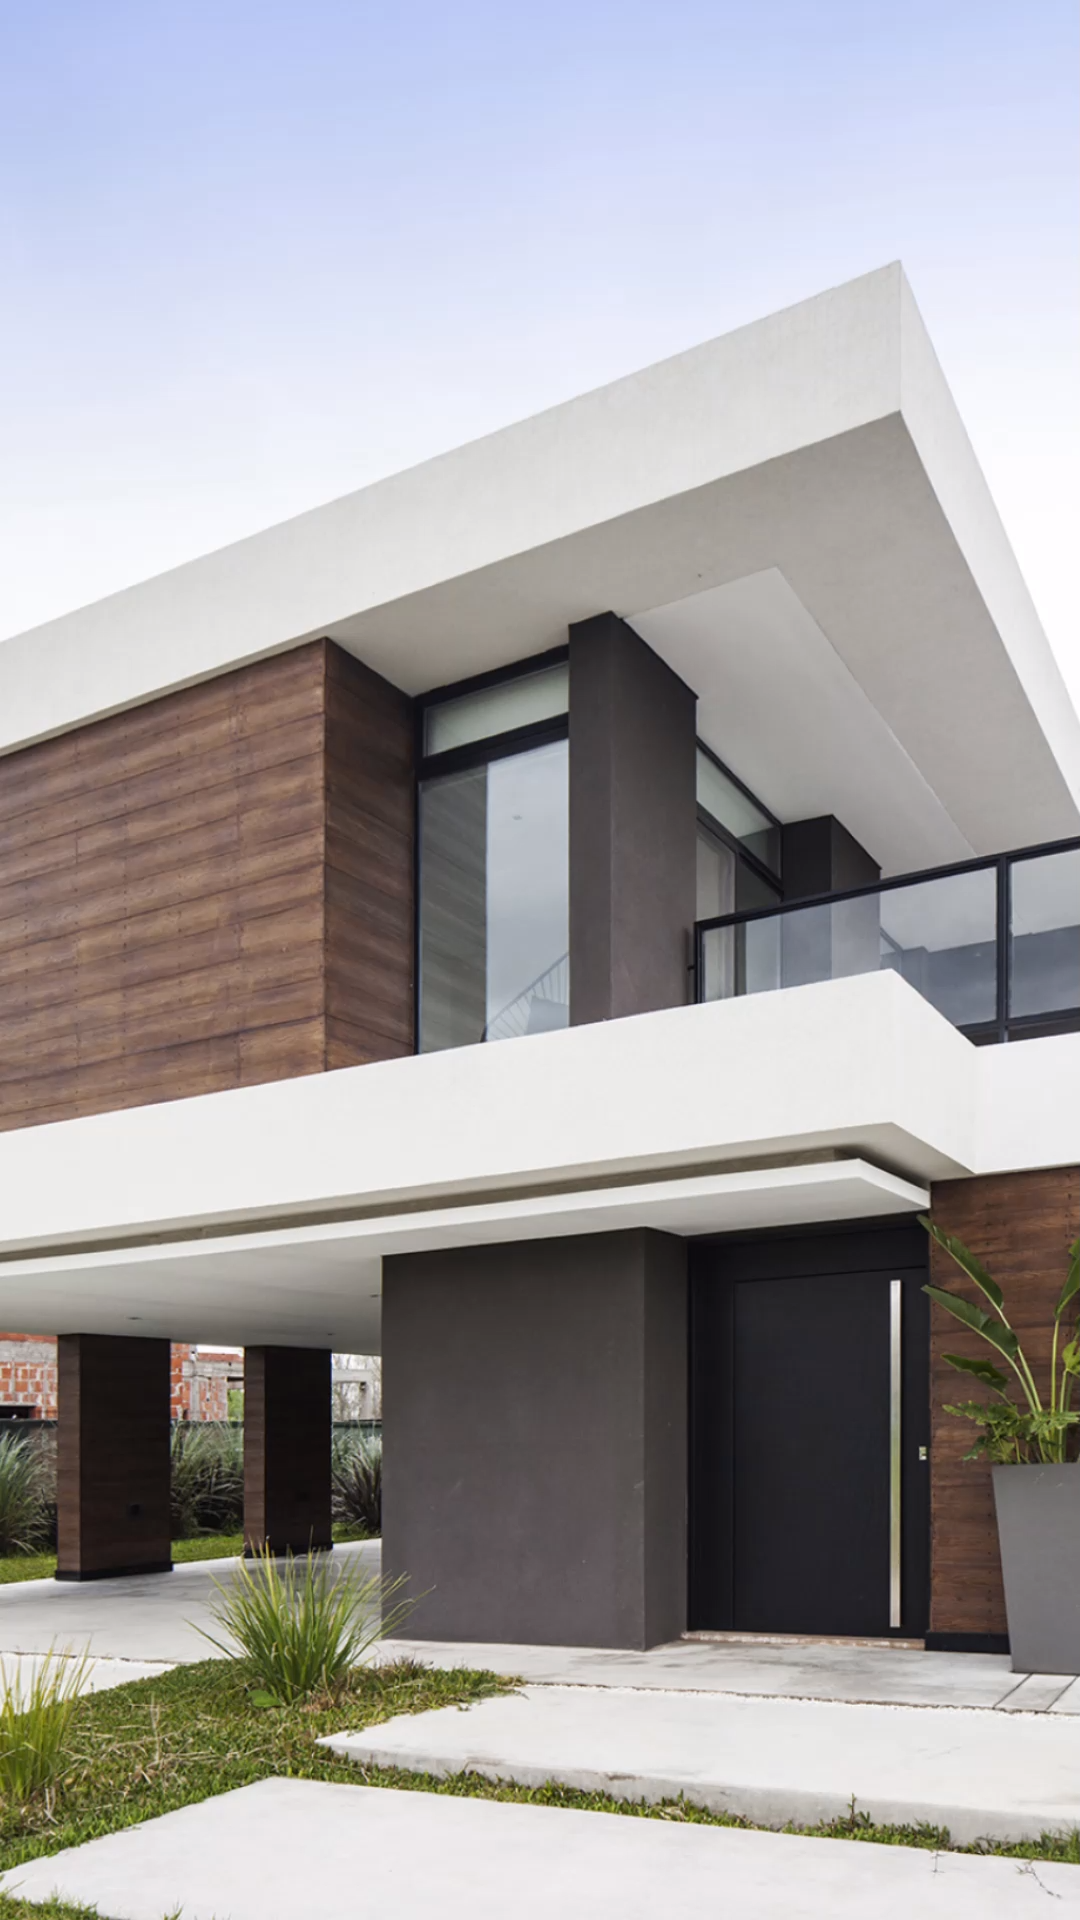 Casa Terra 201 del Estudio de Arquitectura LMARQ Arquitectos